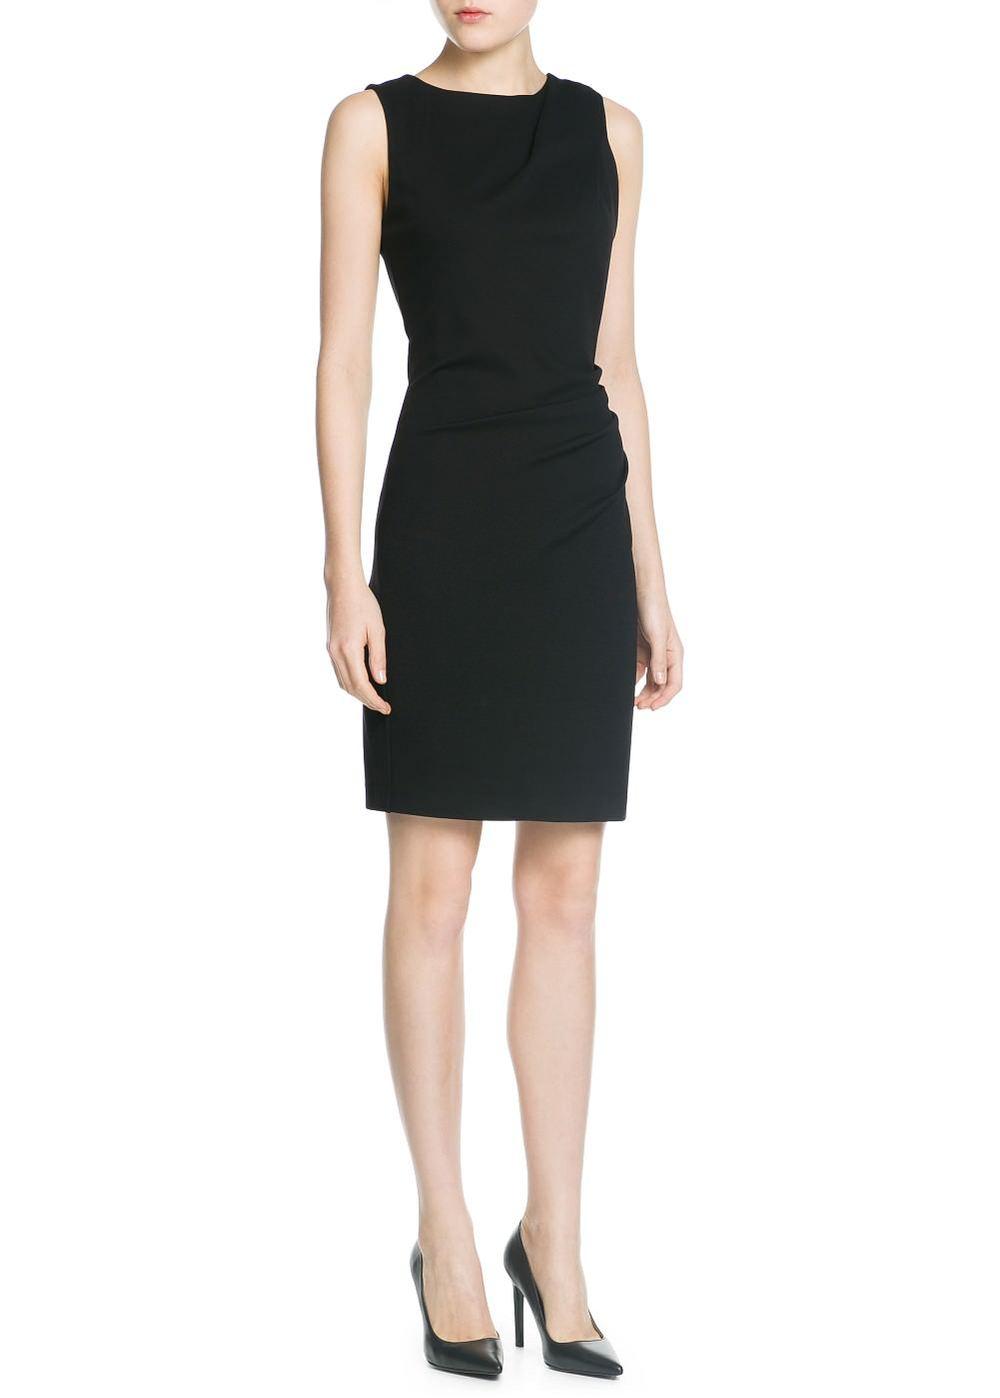 Mature Ladies Round Neck Sleeveless Dress View Mature Ladies Dress Yoozze Product Details From